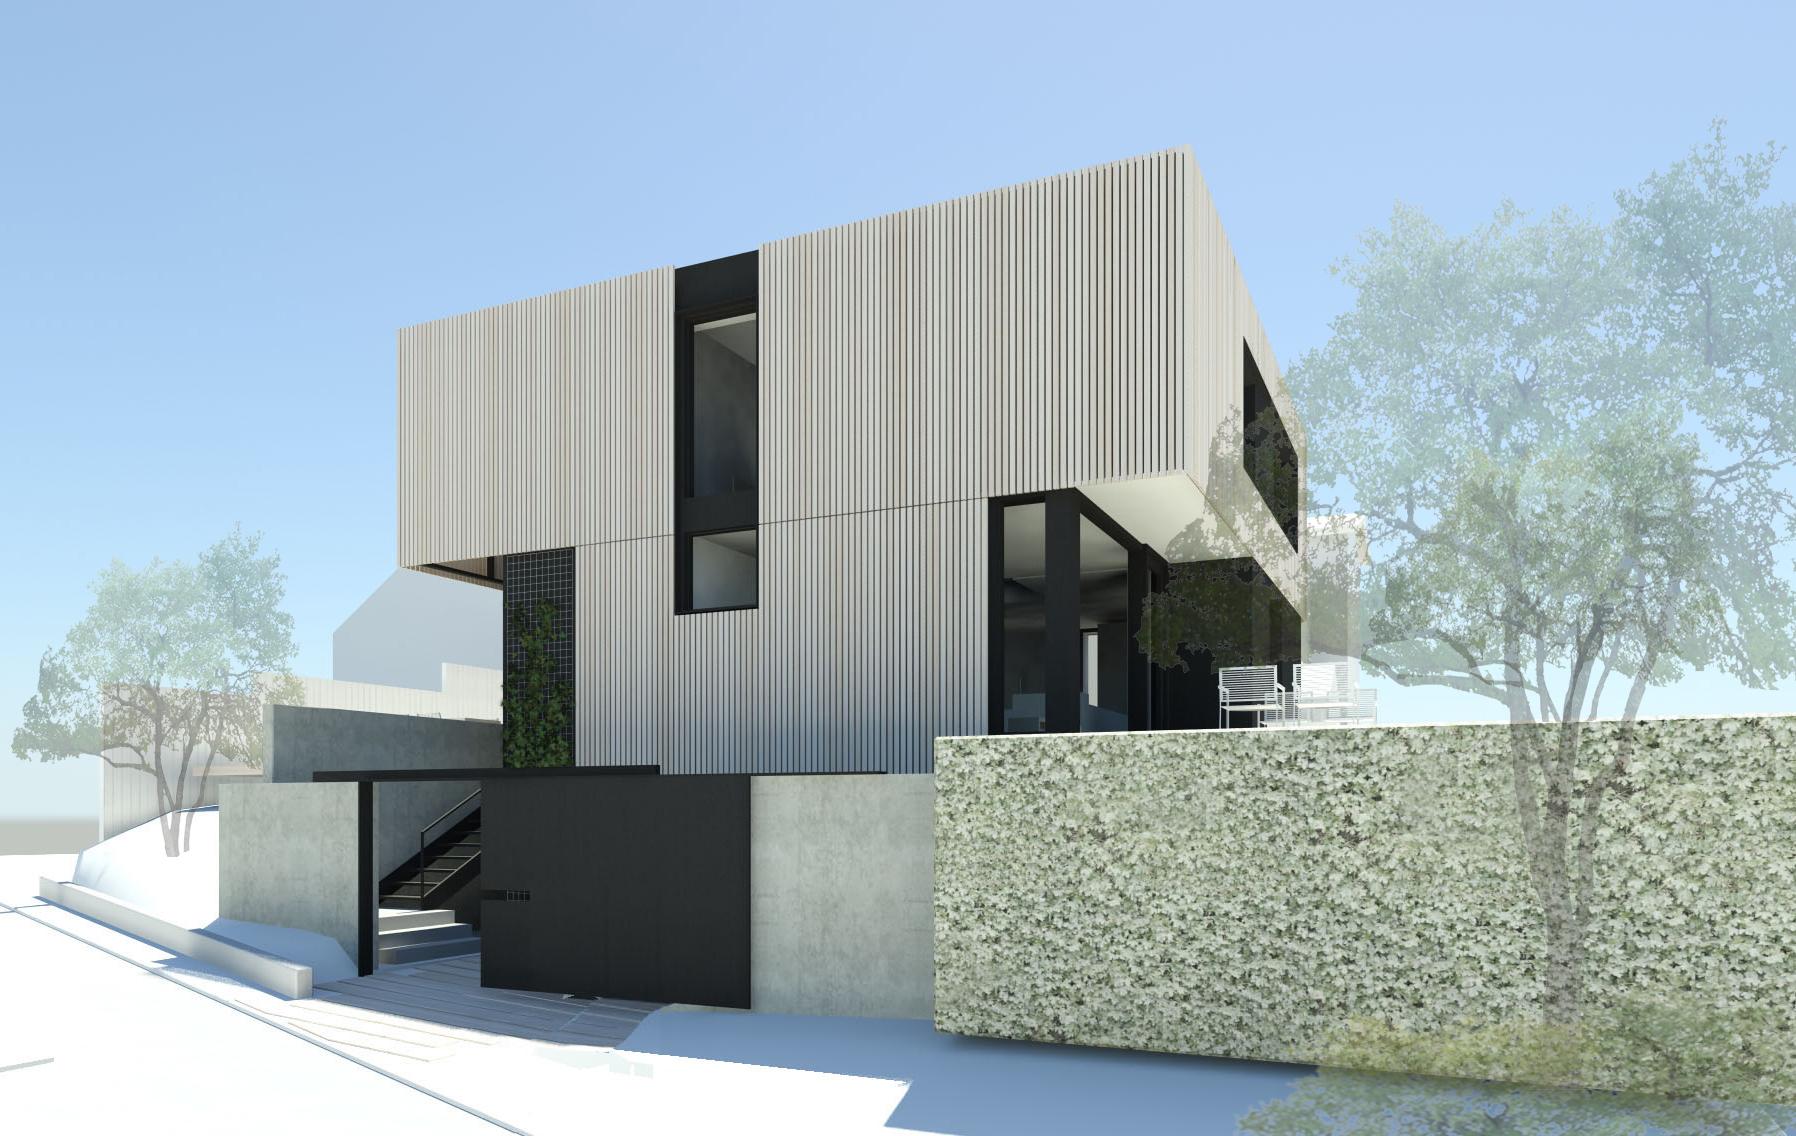 passivhaus an aggregate primer brute force collaborative. Black Bedroom Furniture Sets. Home Design Ideas